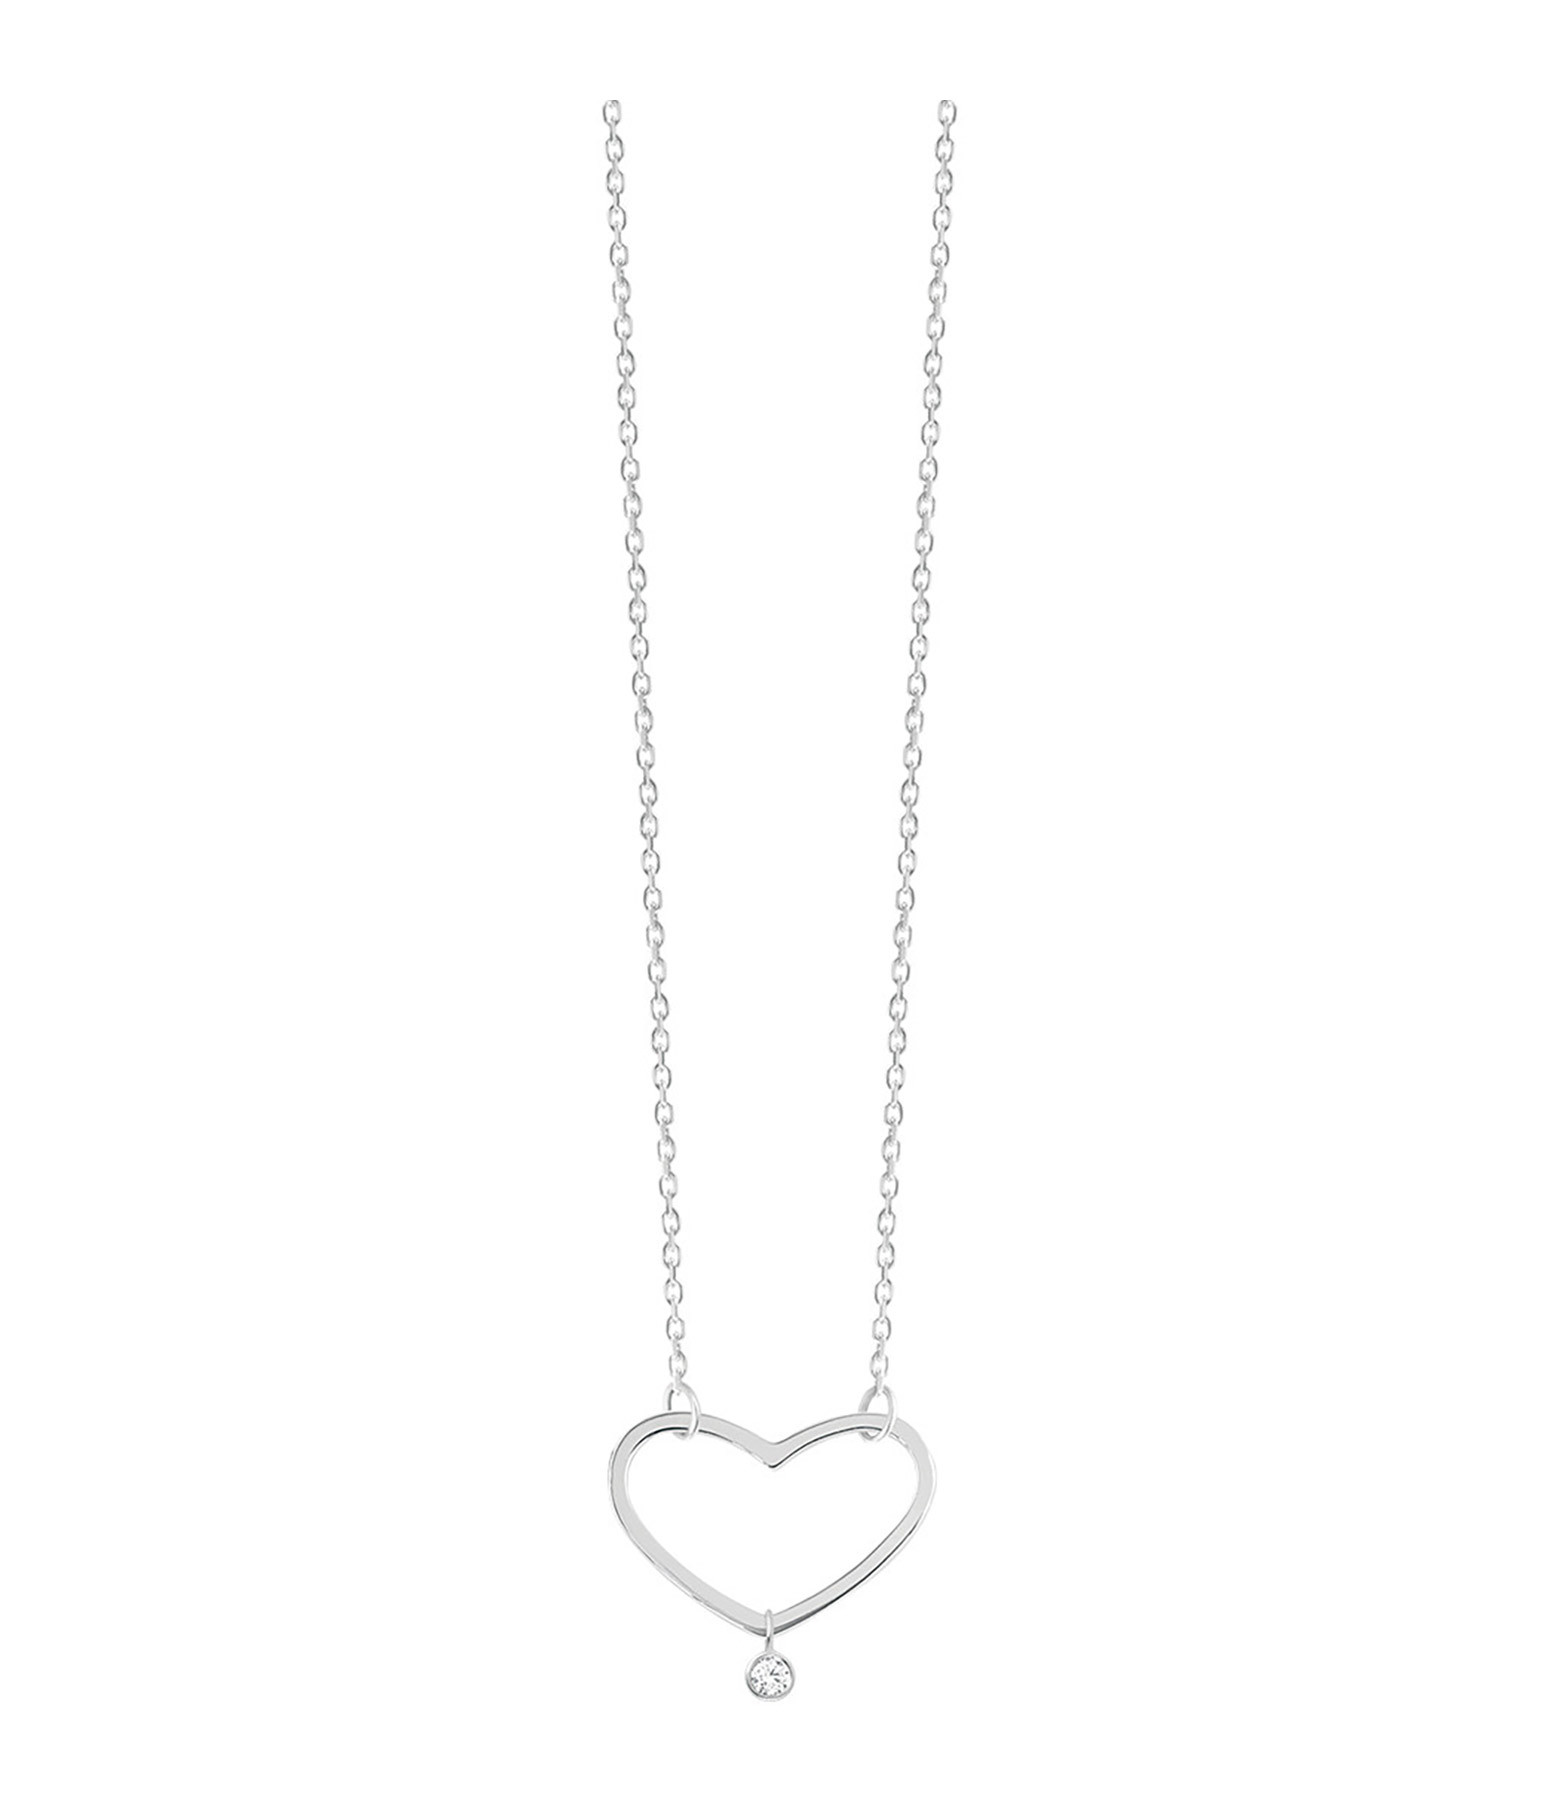 VANRYCKE - Collier Angie Or Blanc Diamant S